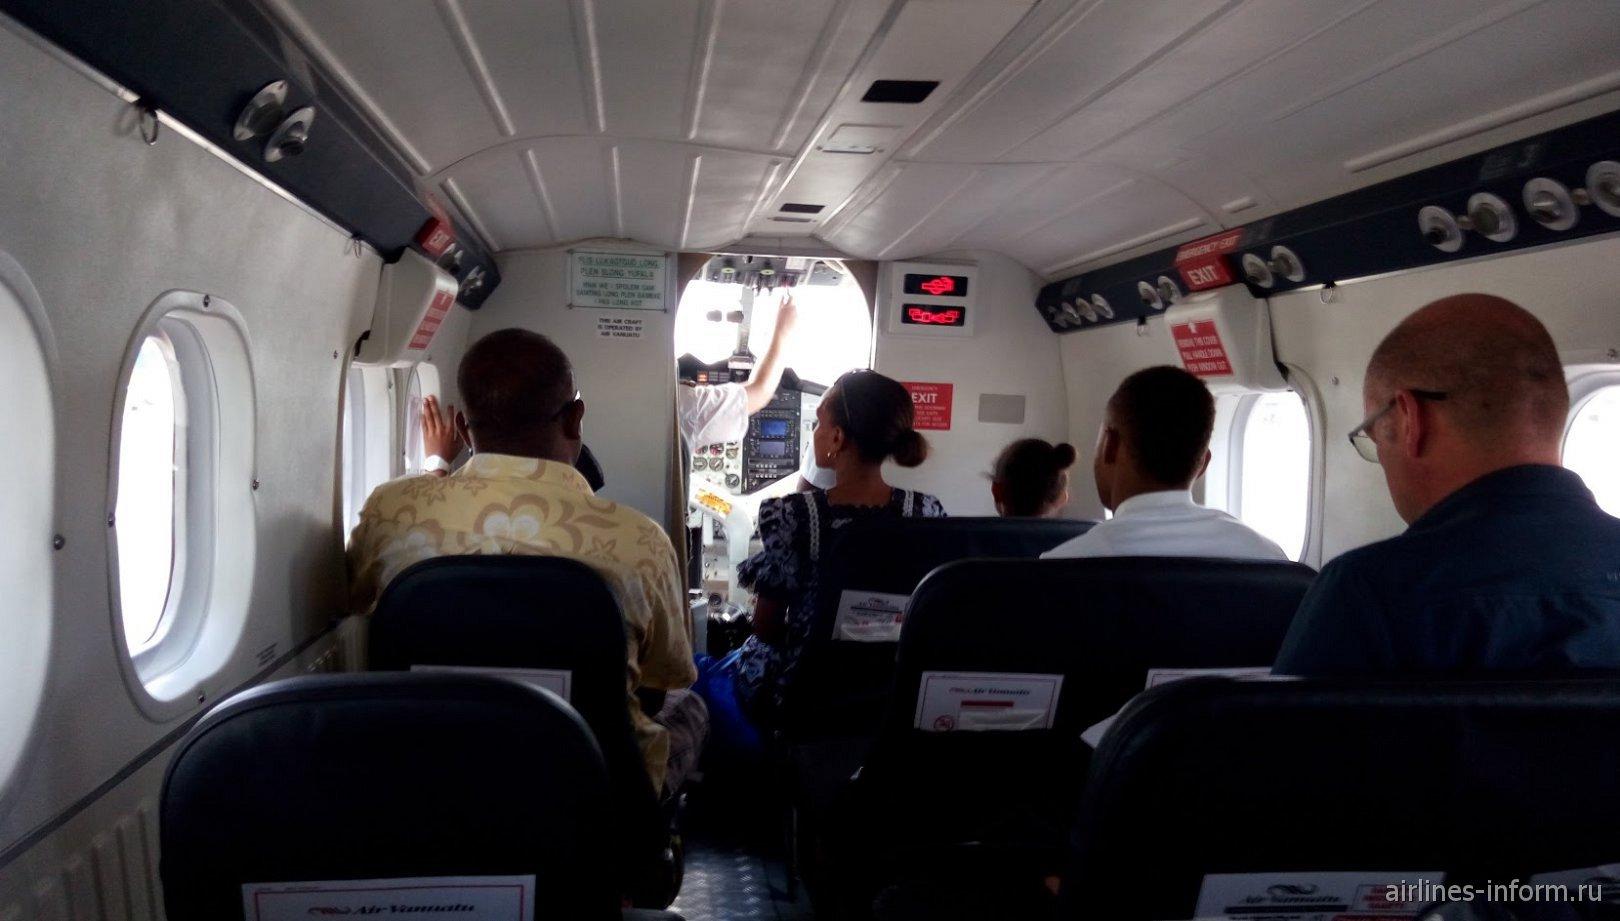 Пассажирский салон самолета Bombardier DHC-6-300 Twin Otter авиакомпании Air Vanuatu